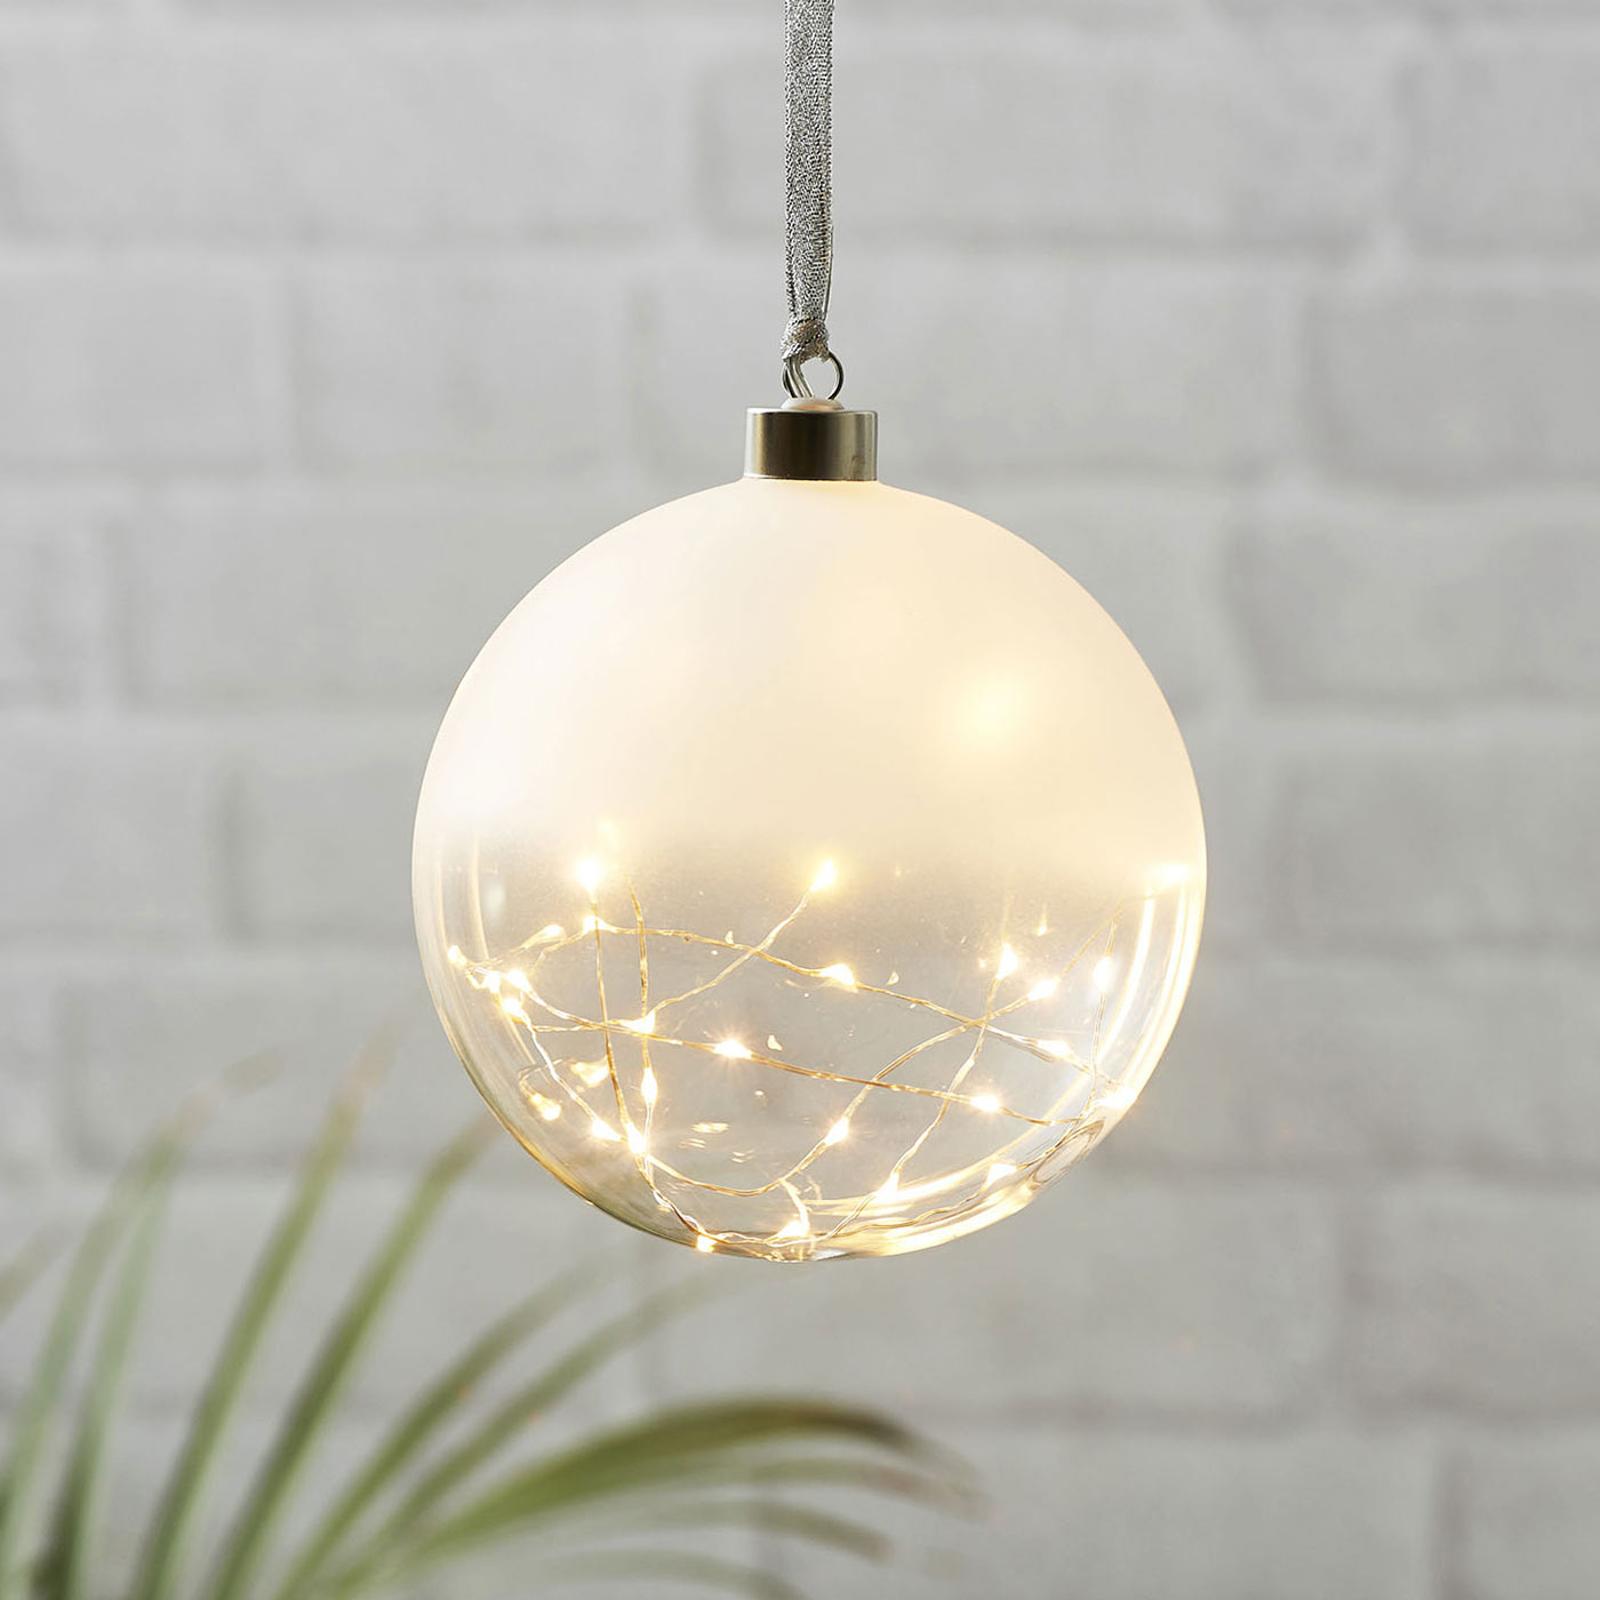 Glow LED-dekokugle, frostet/klar